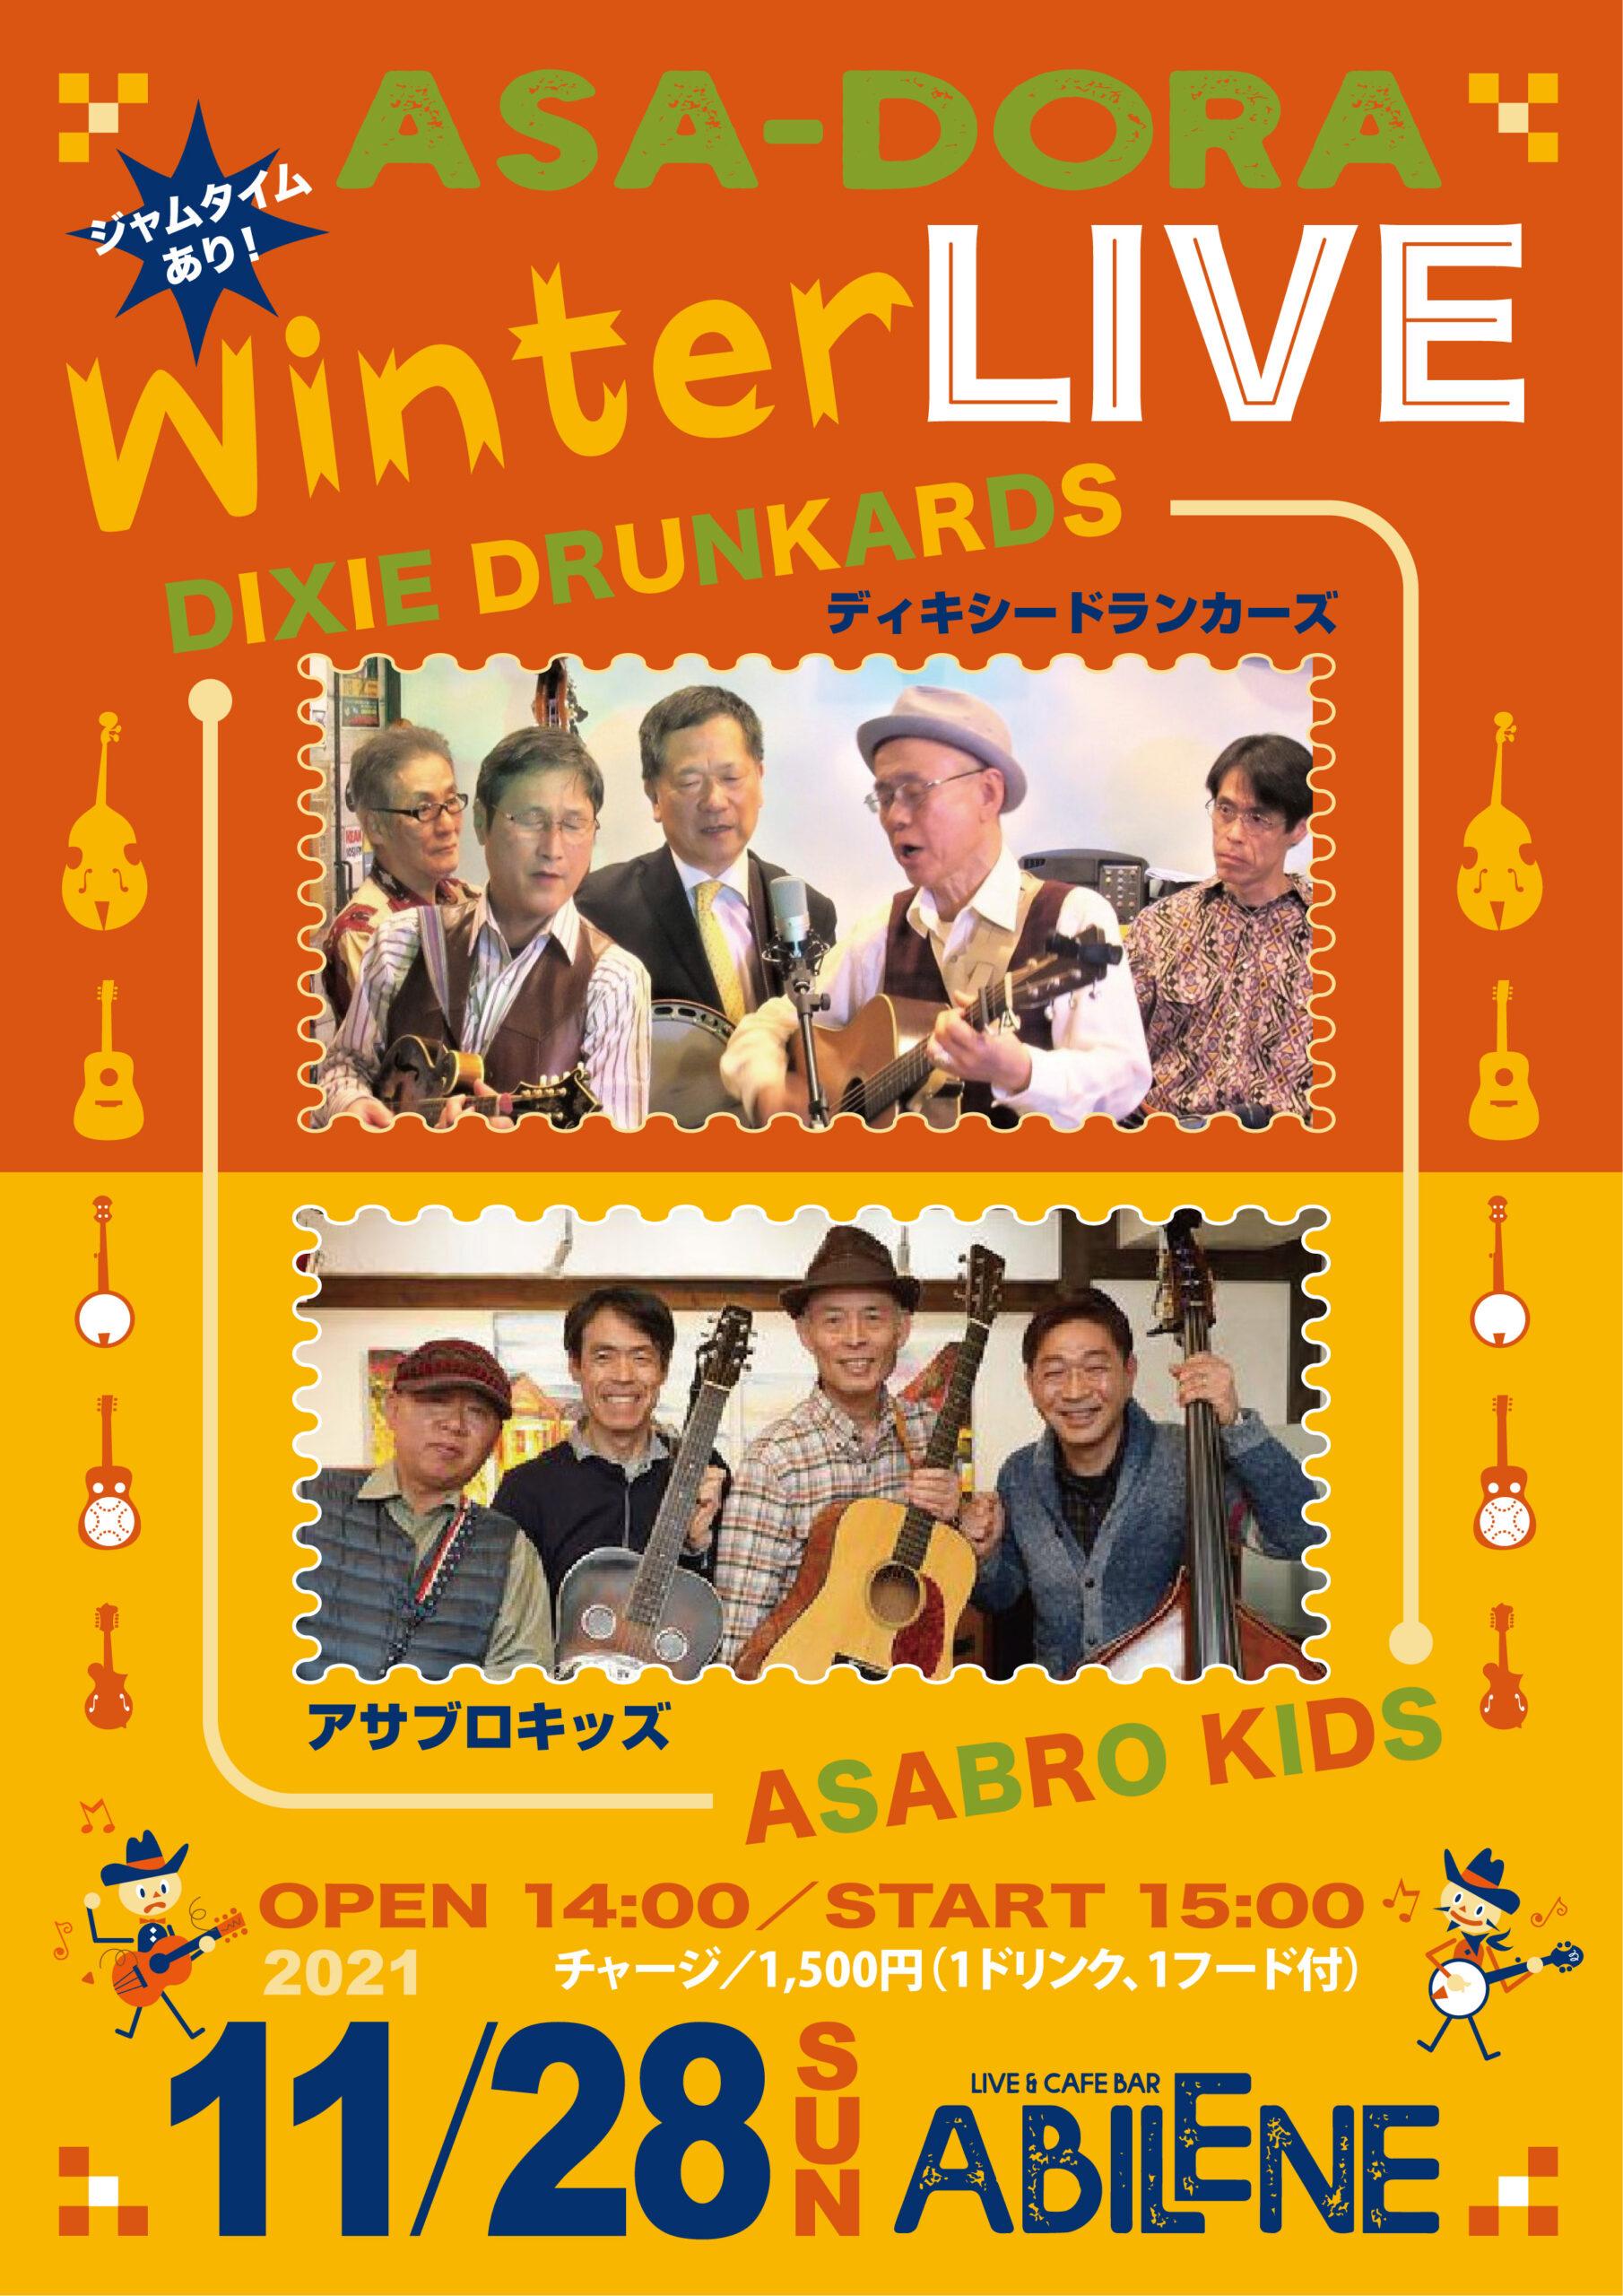 ASA-DORA Winter Live